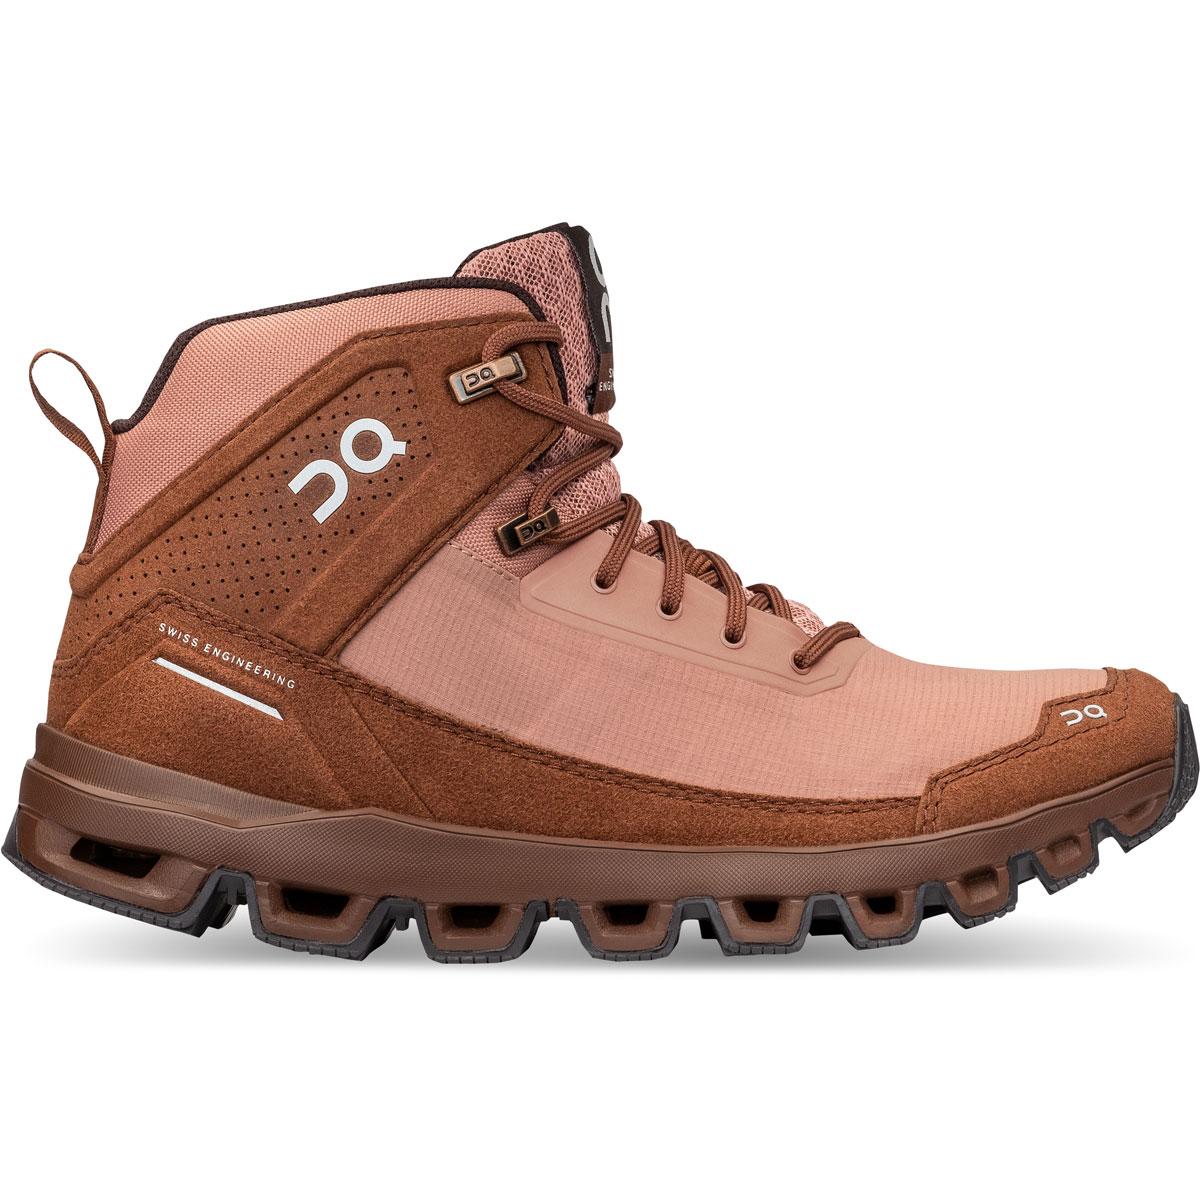 Women's On Cloudridge Hiking Shoe - Color: Mocha | Pebble - Size: 5 - Width: Regular, Mocha | Pebble, large, image 1